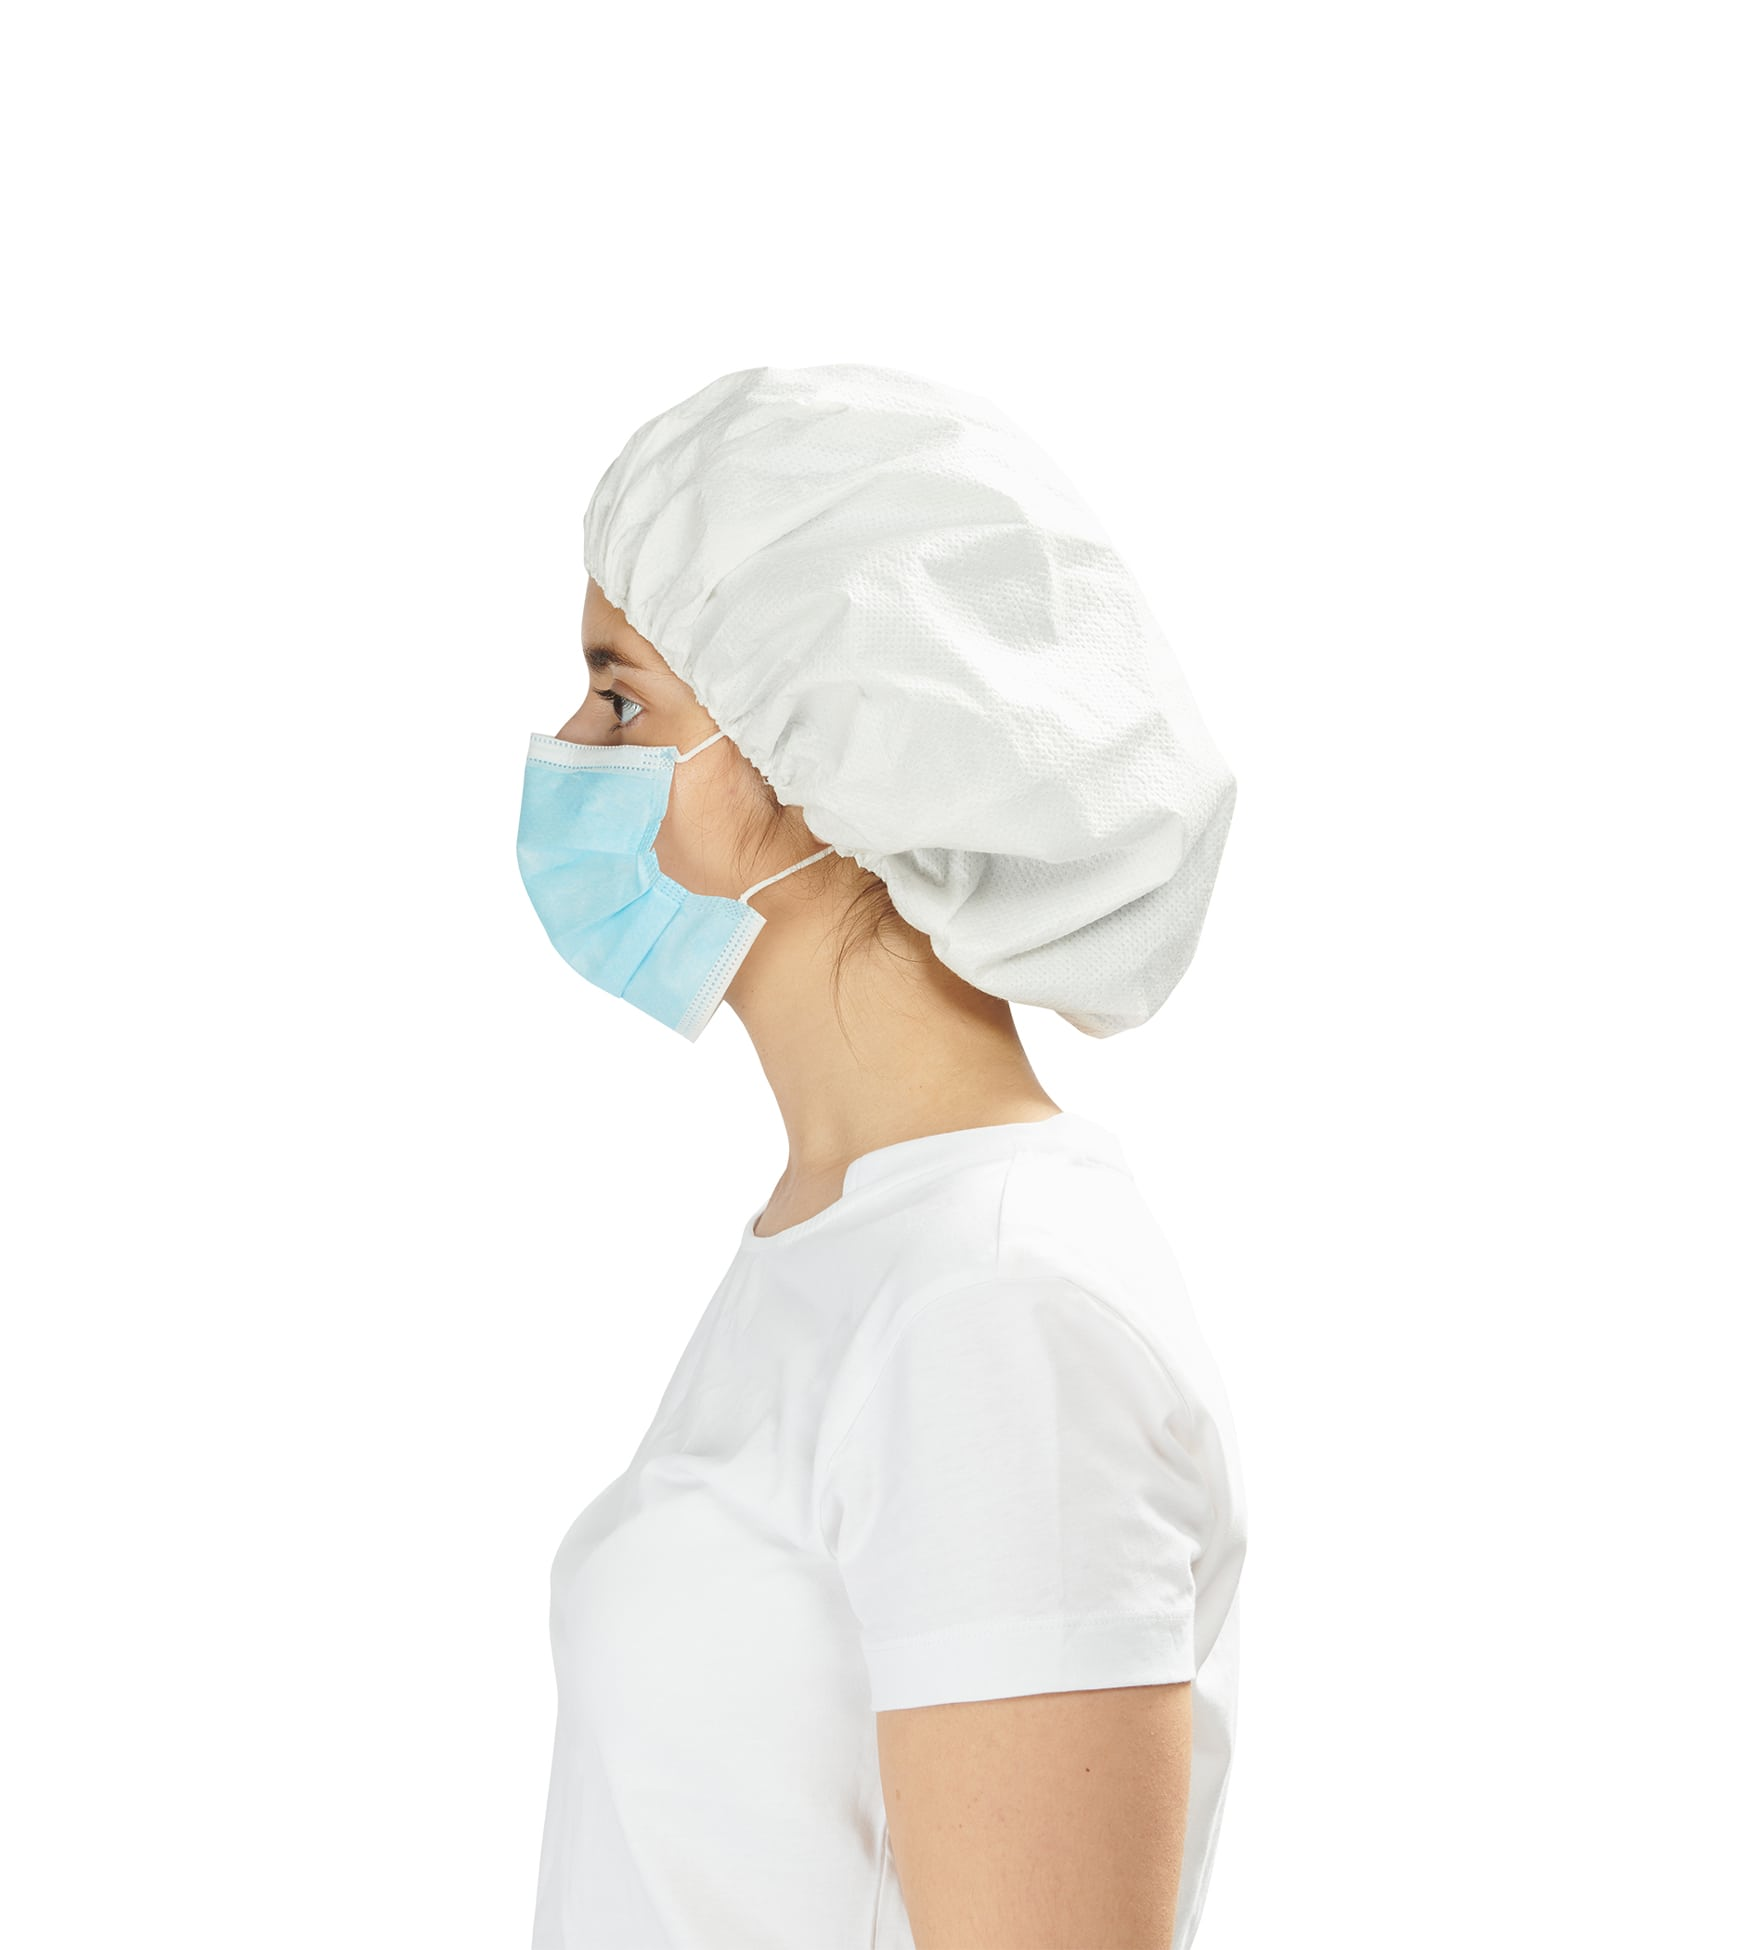 toucas impermeáveis 2 - waterproof caps - clothe protect